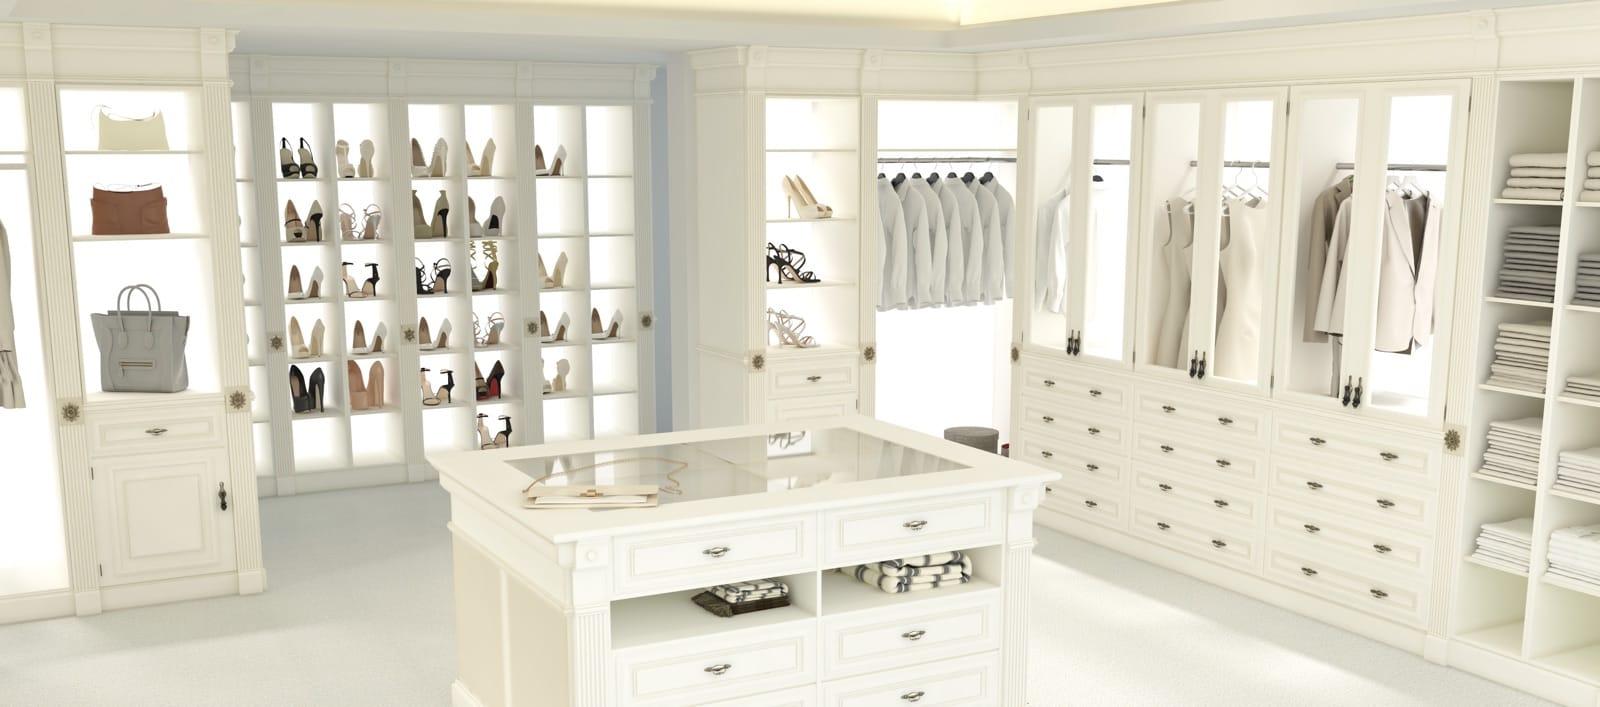 Wardrobe Rooms Los Angeles Custom Designed Amp Built Closets